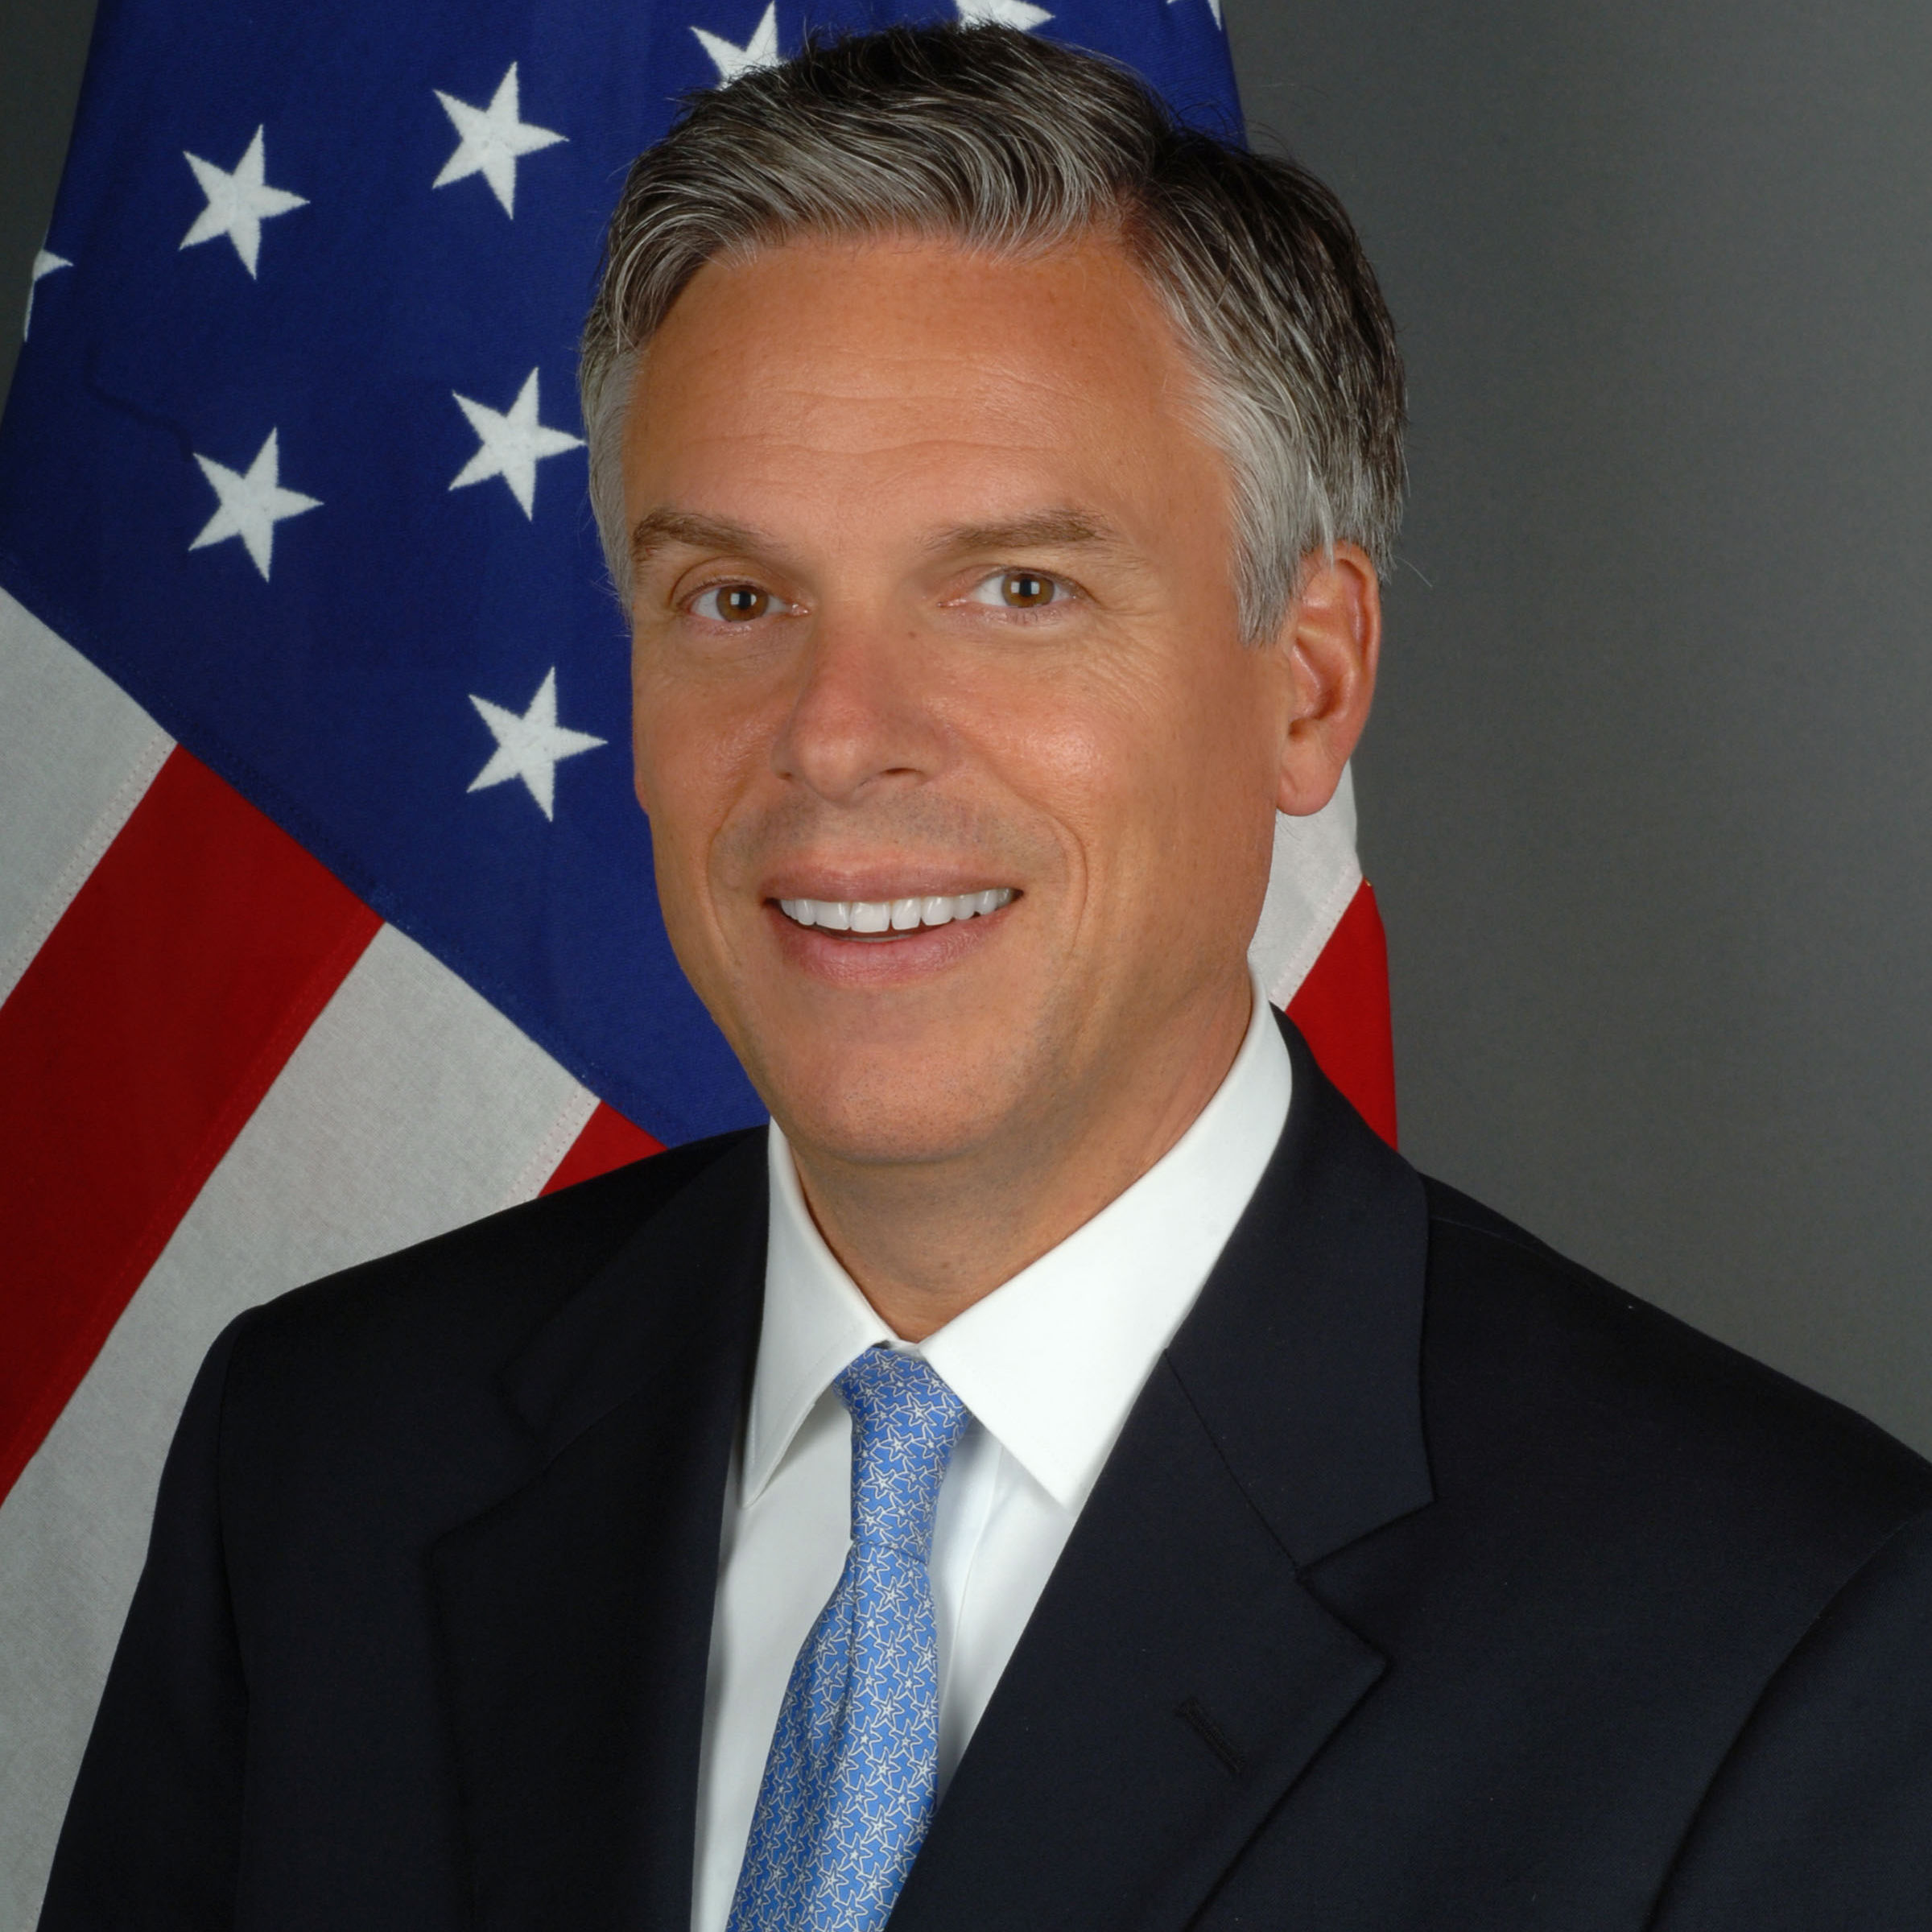 Ambassador jon huntsman qovkod